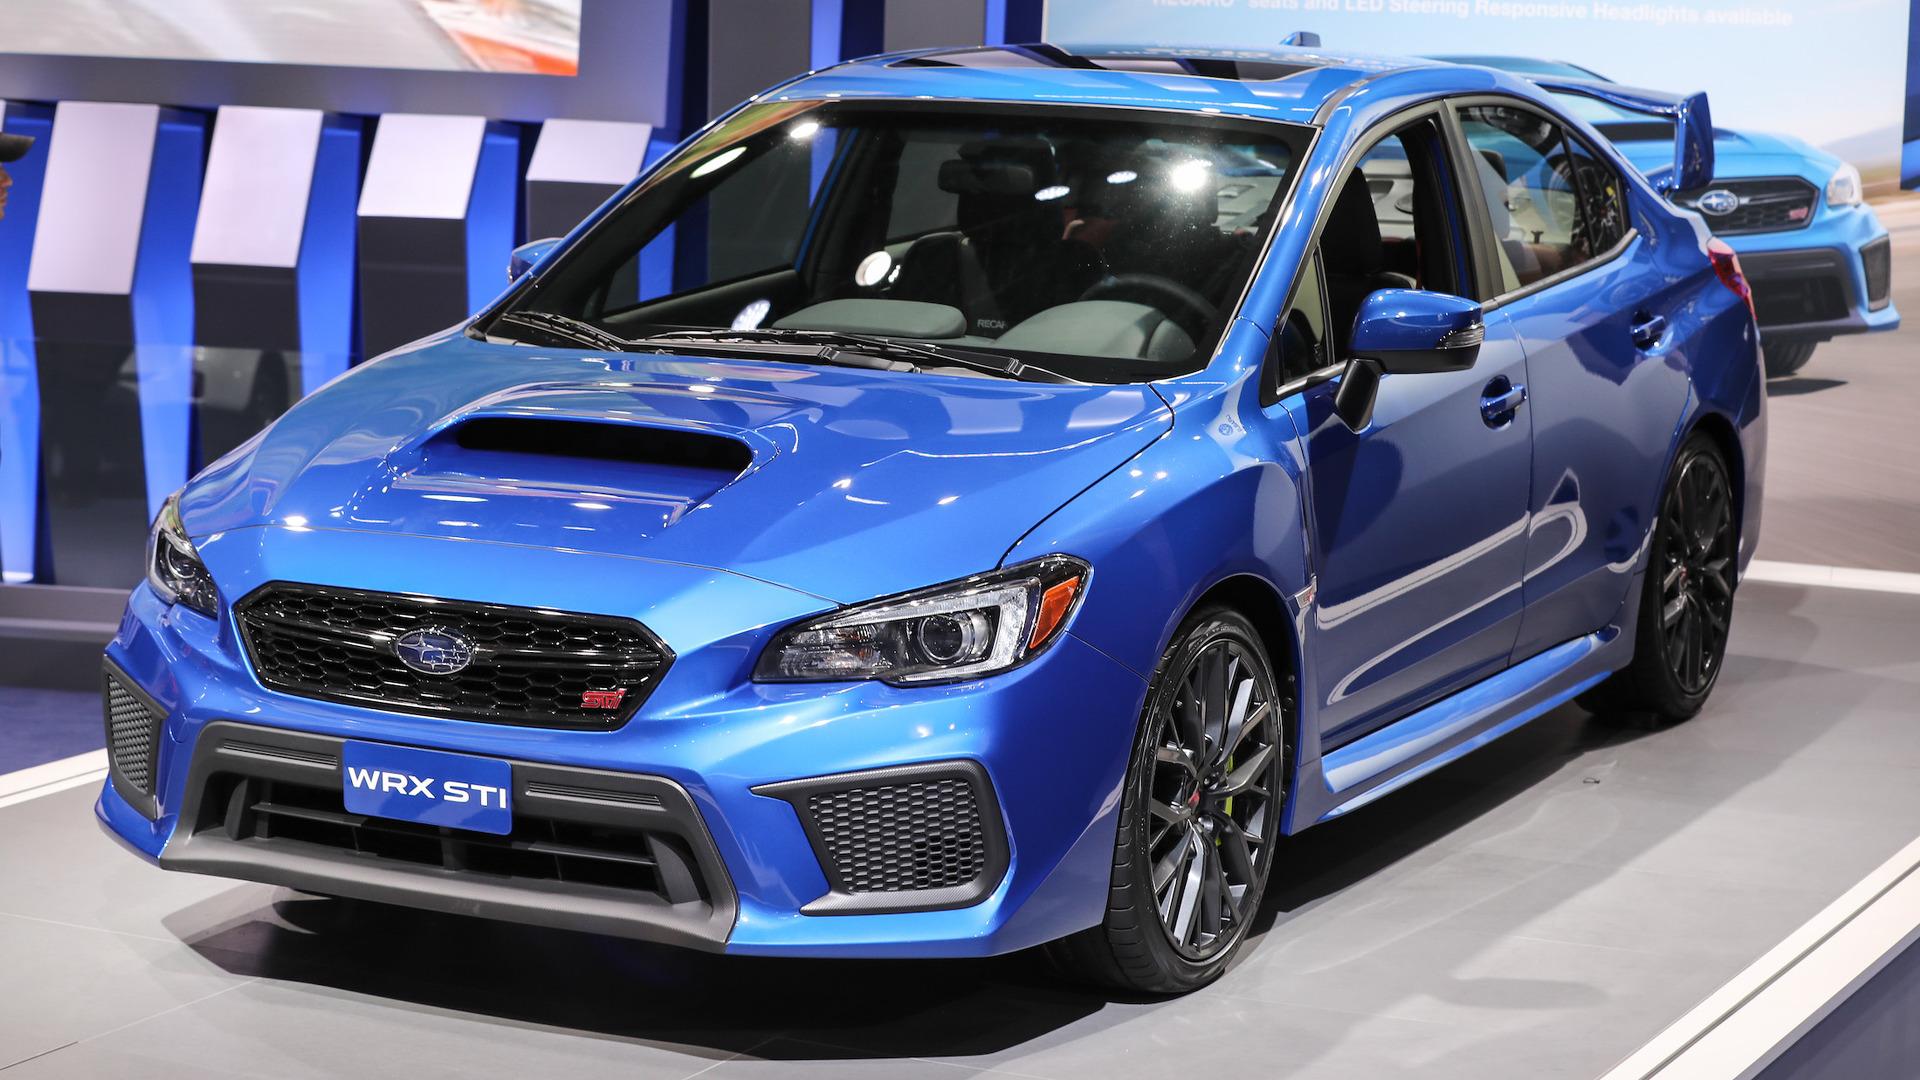 Refreshed Subaru WRX And STI Start $340 More Than Last year